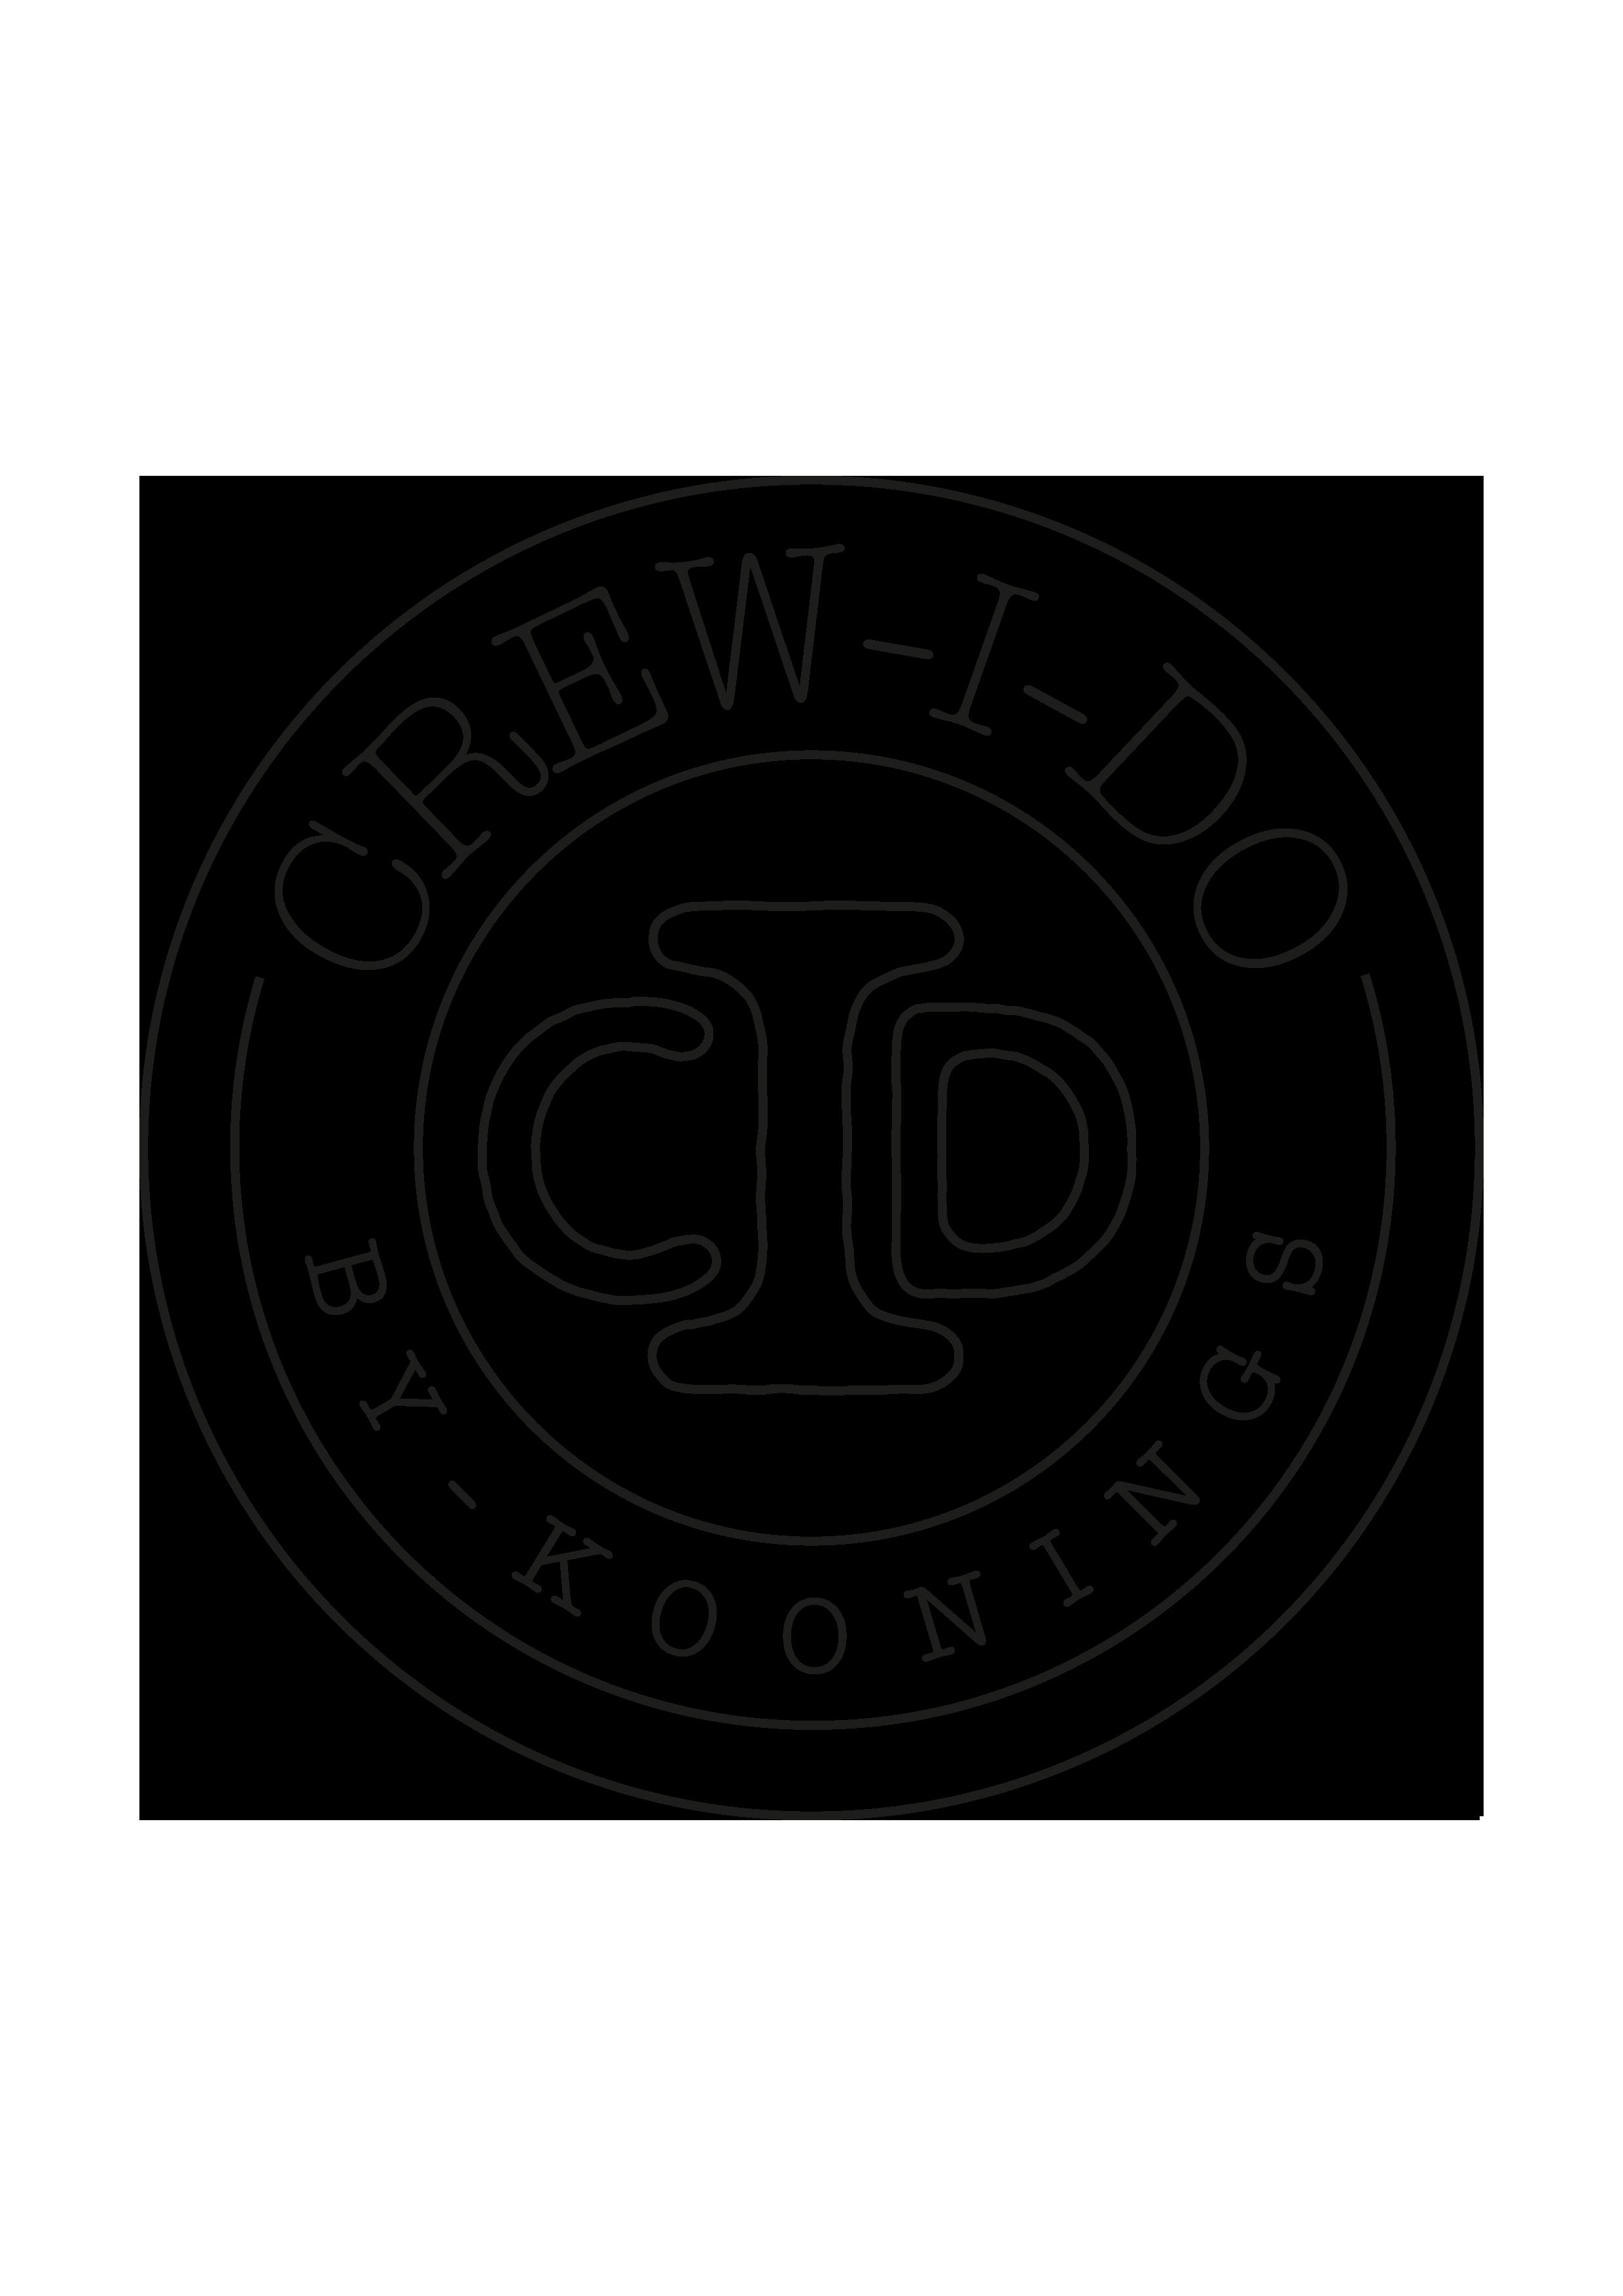 Crew I Do by Koonings